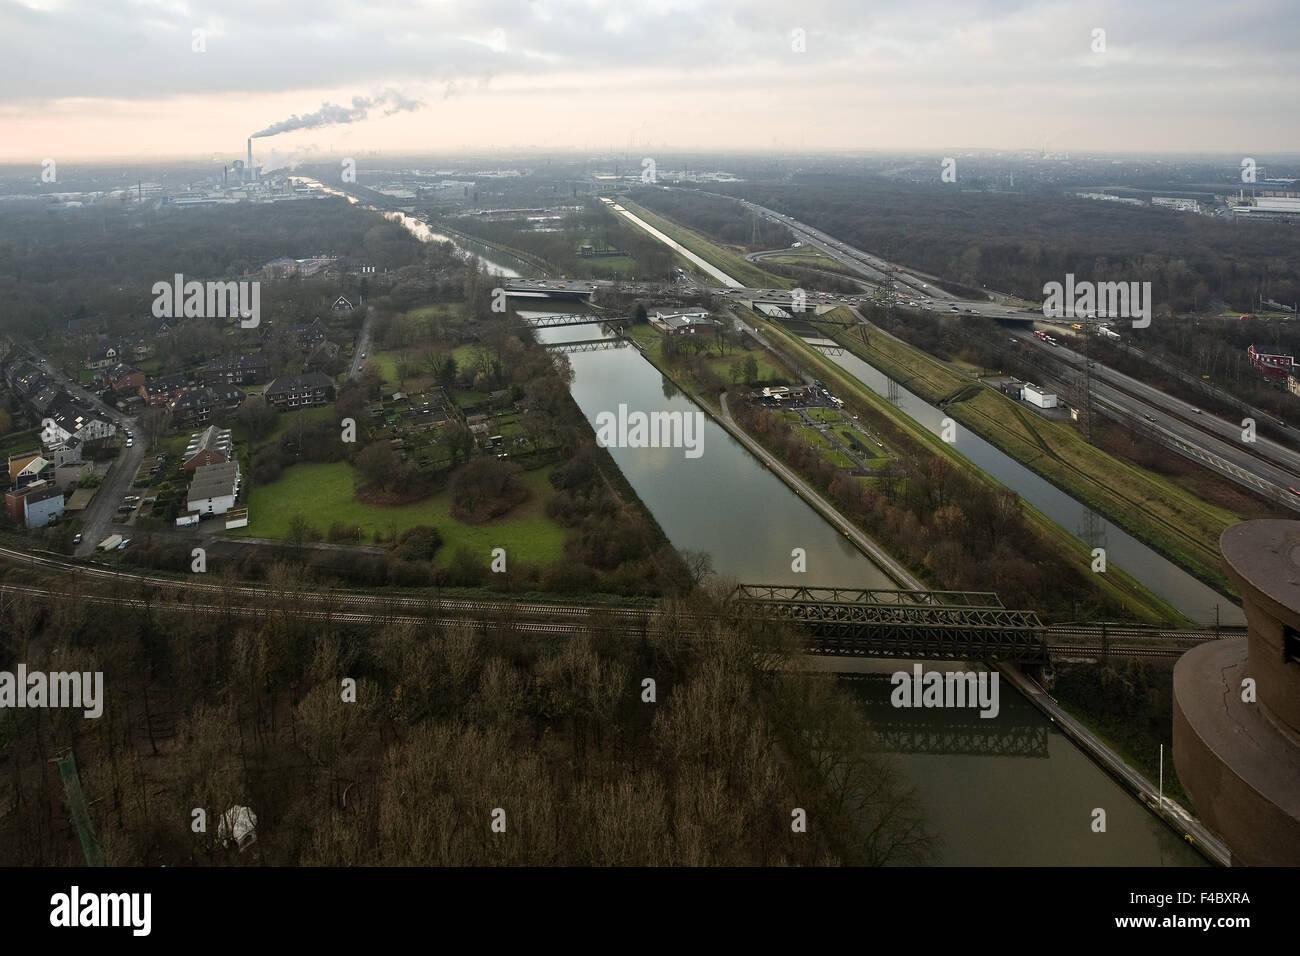 Overlooking Oberhausen, Germany - Stock Image